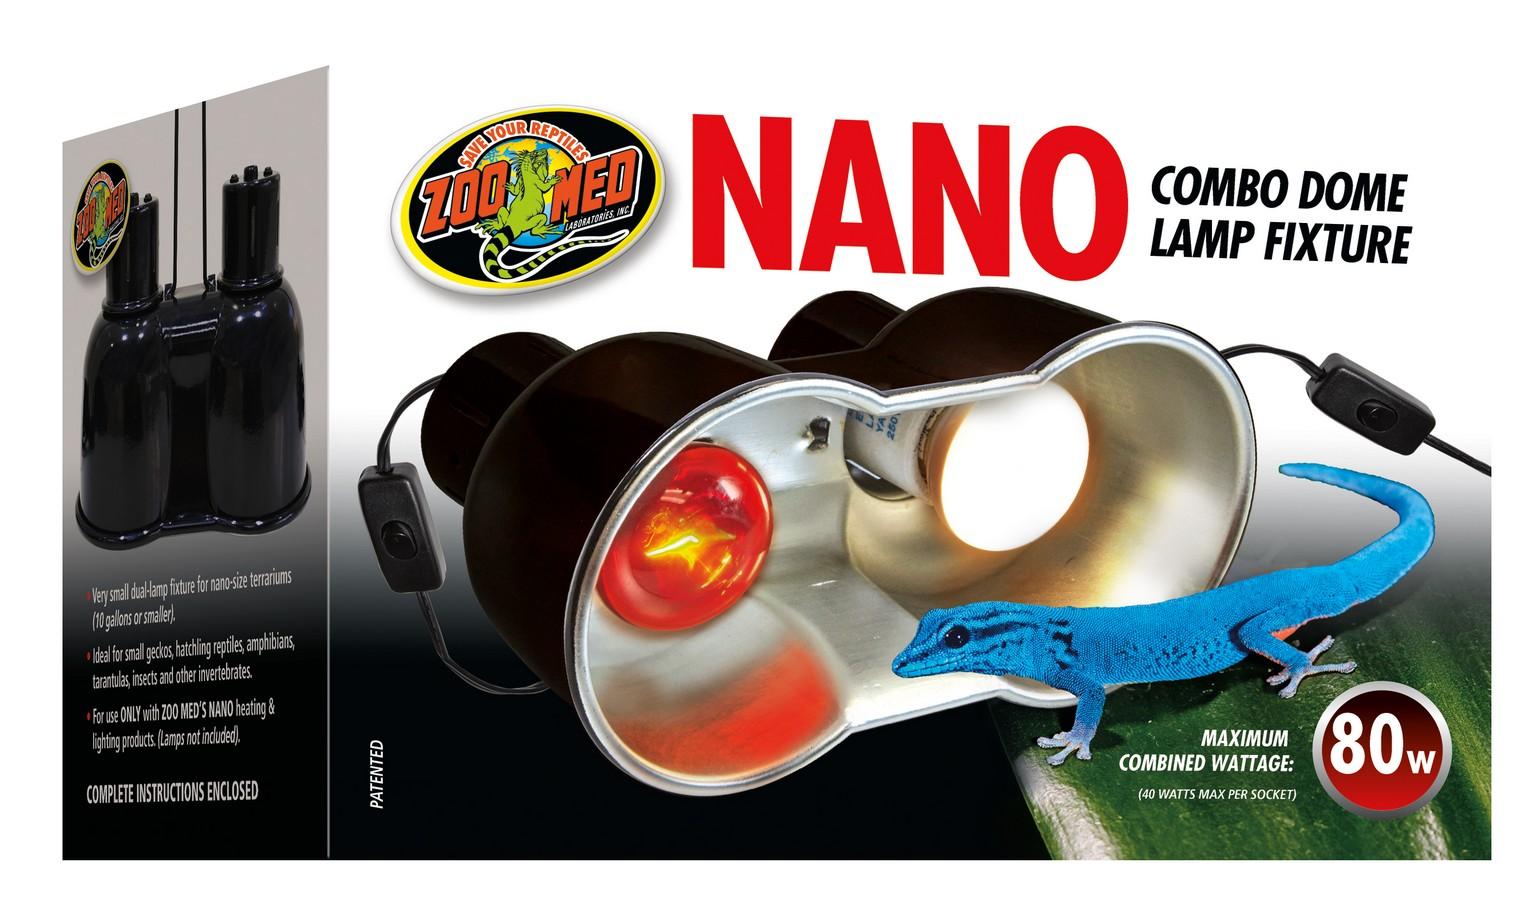 Zoo Med Nano Combo Dome Reptile Lamp Fixture